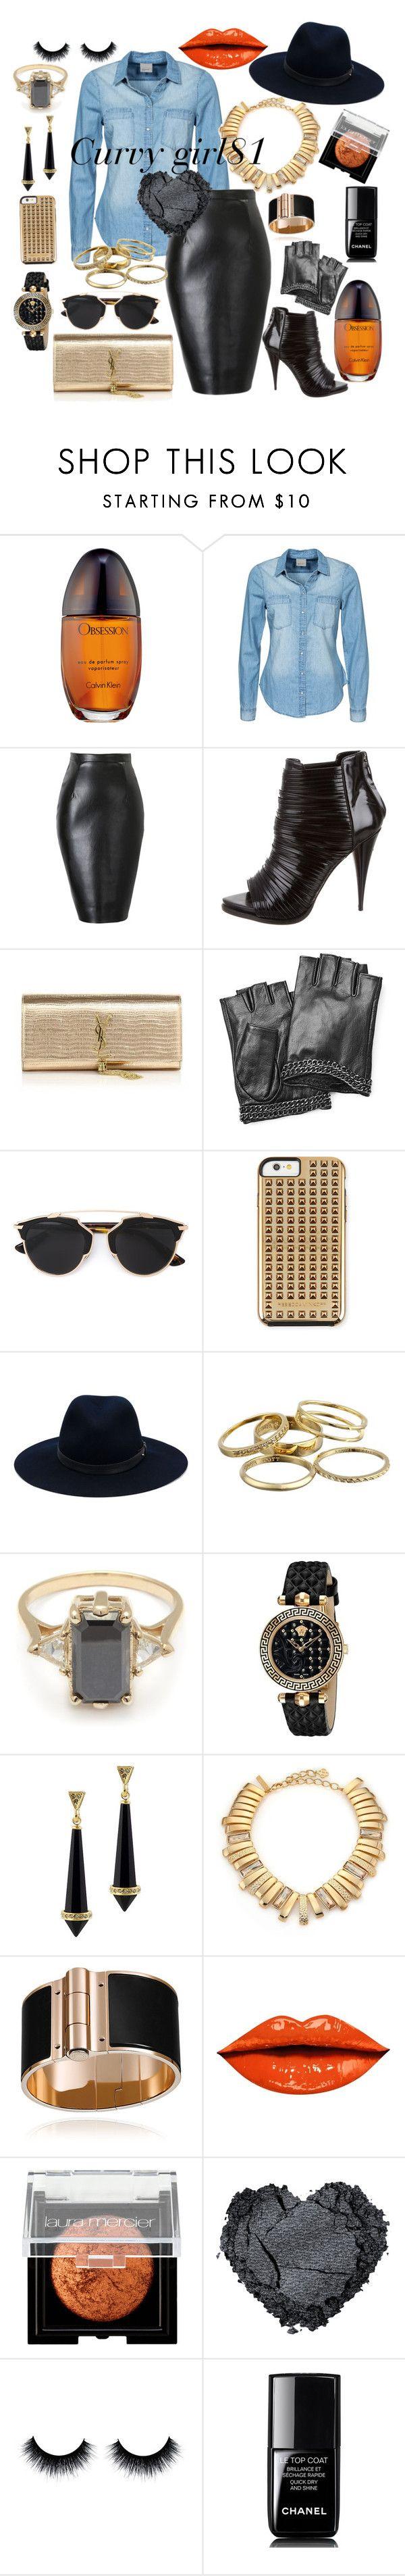 """strong gold"" by pretty-girl81 on Polyvore featuring moda, Calvin Klein, Vero Moda, Givenchy, Yves Saint Laurent, Karl Lagerfeld, Christian Dior, Rebecca Minkoff, rag & bone e Kendra Scott"